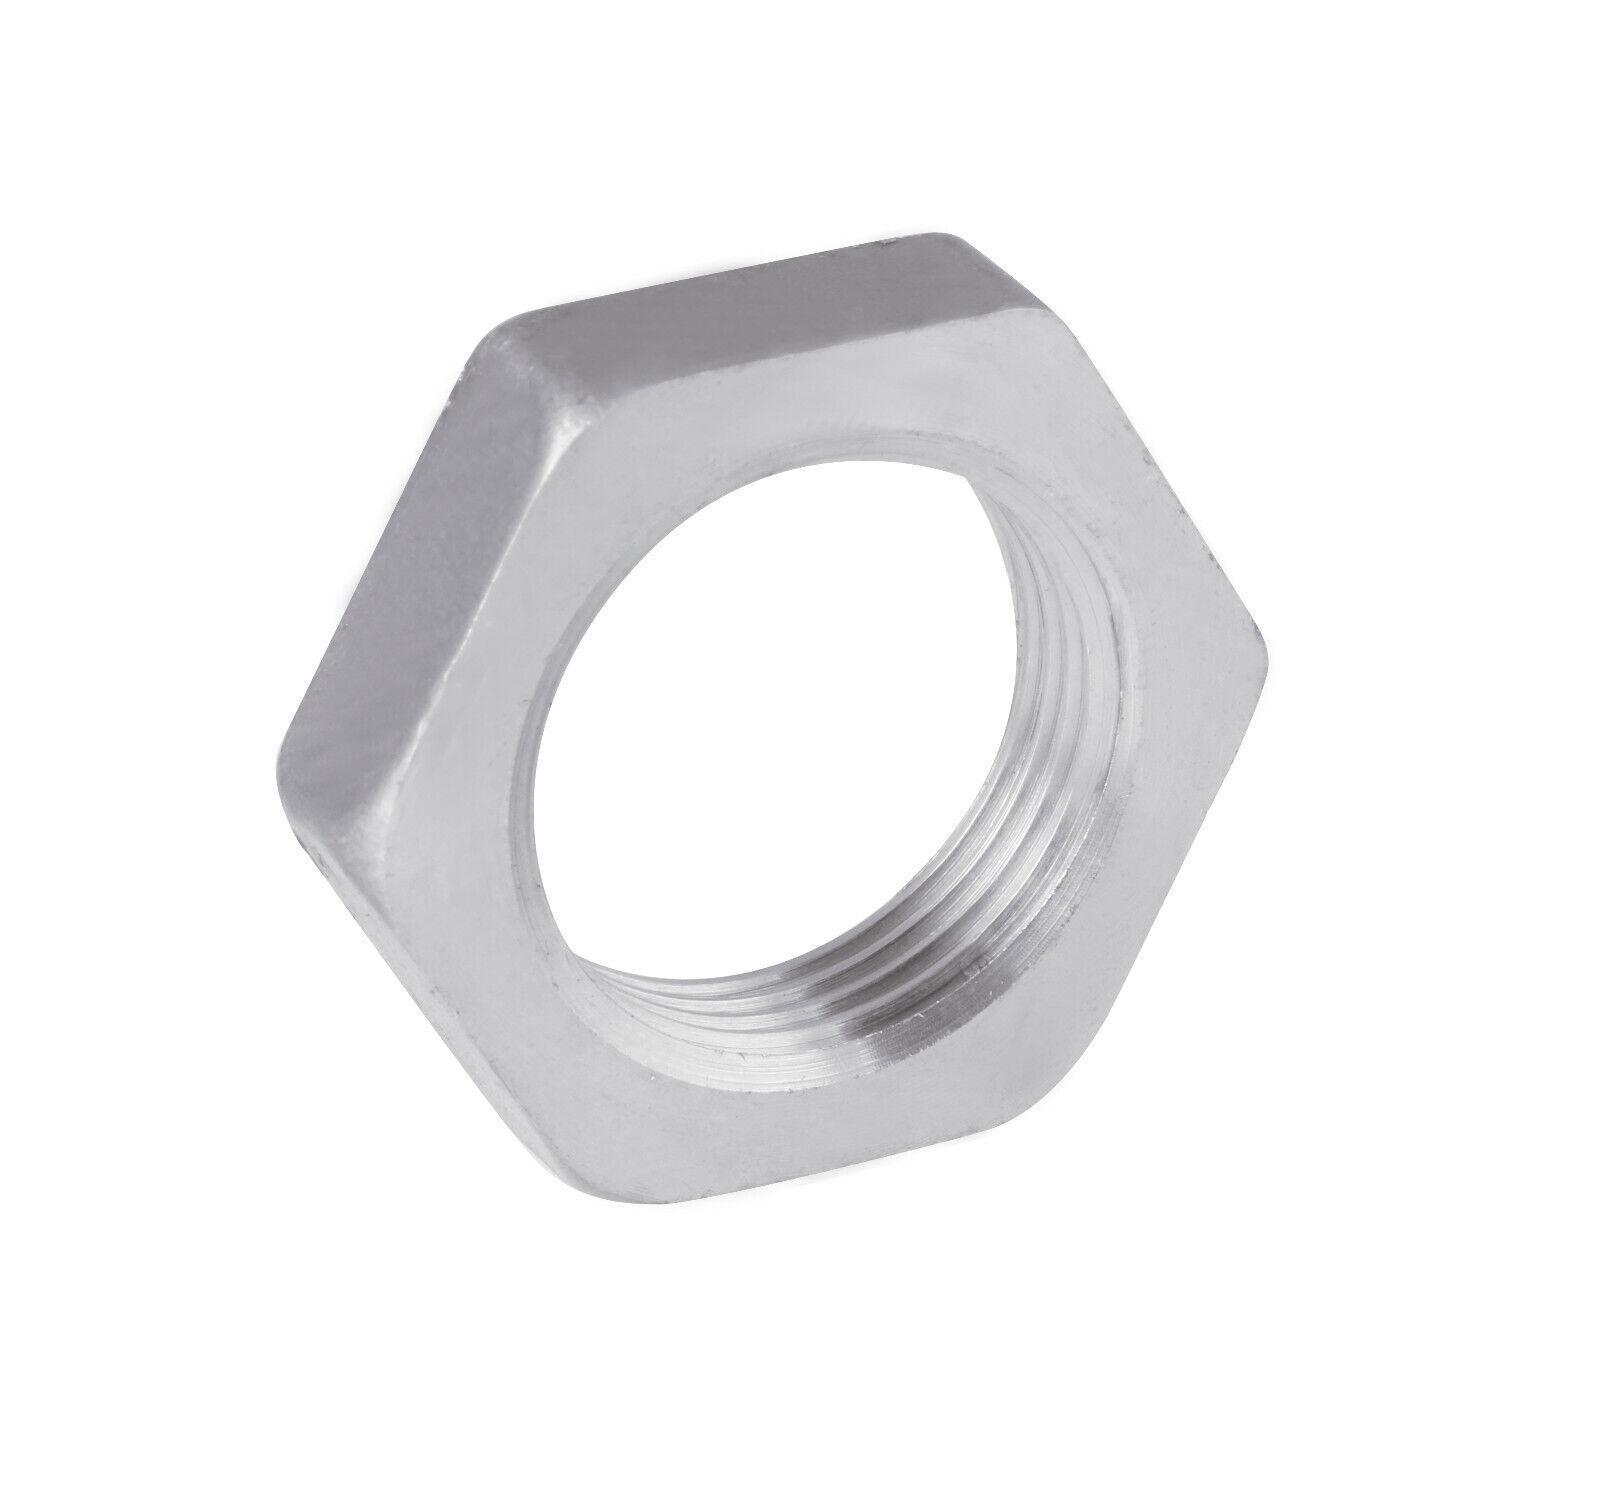 DIN431 Rohrmutter Zoll-Rohrgewinde Edelstahl A2 A4, Stahl 14H G1 2  bis G 1 1 4